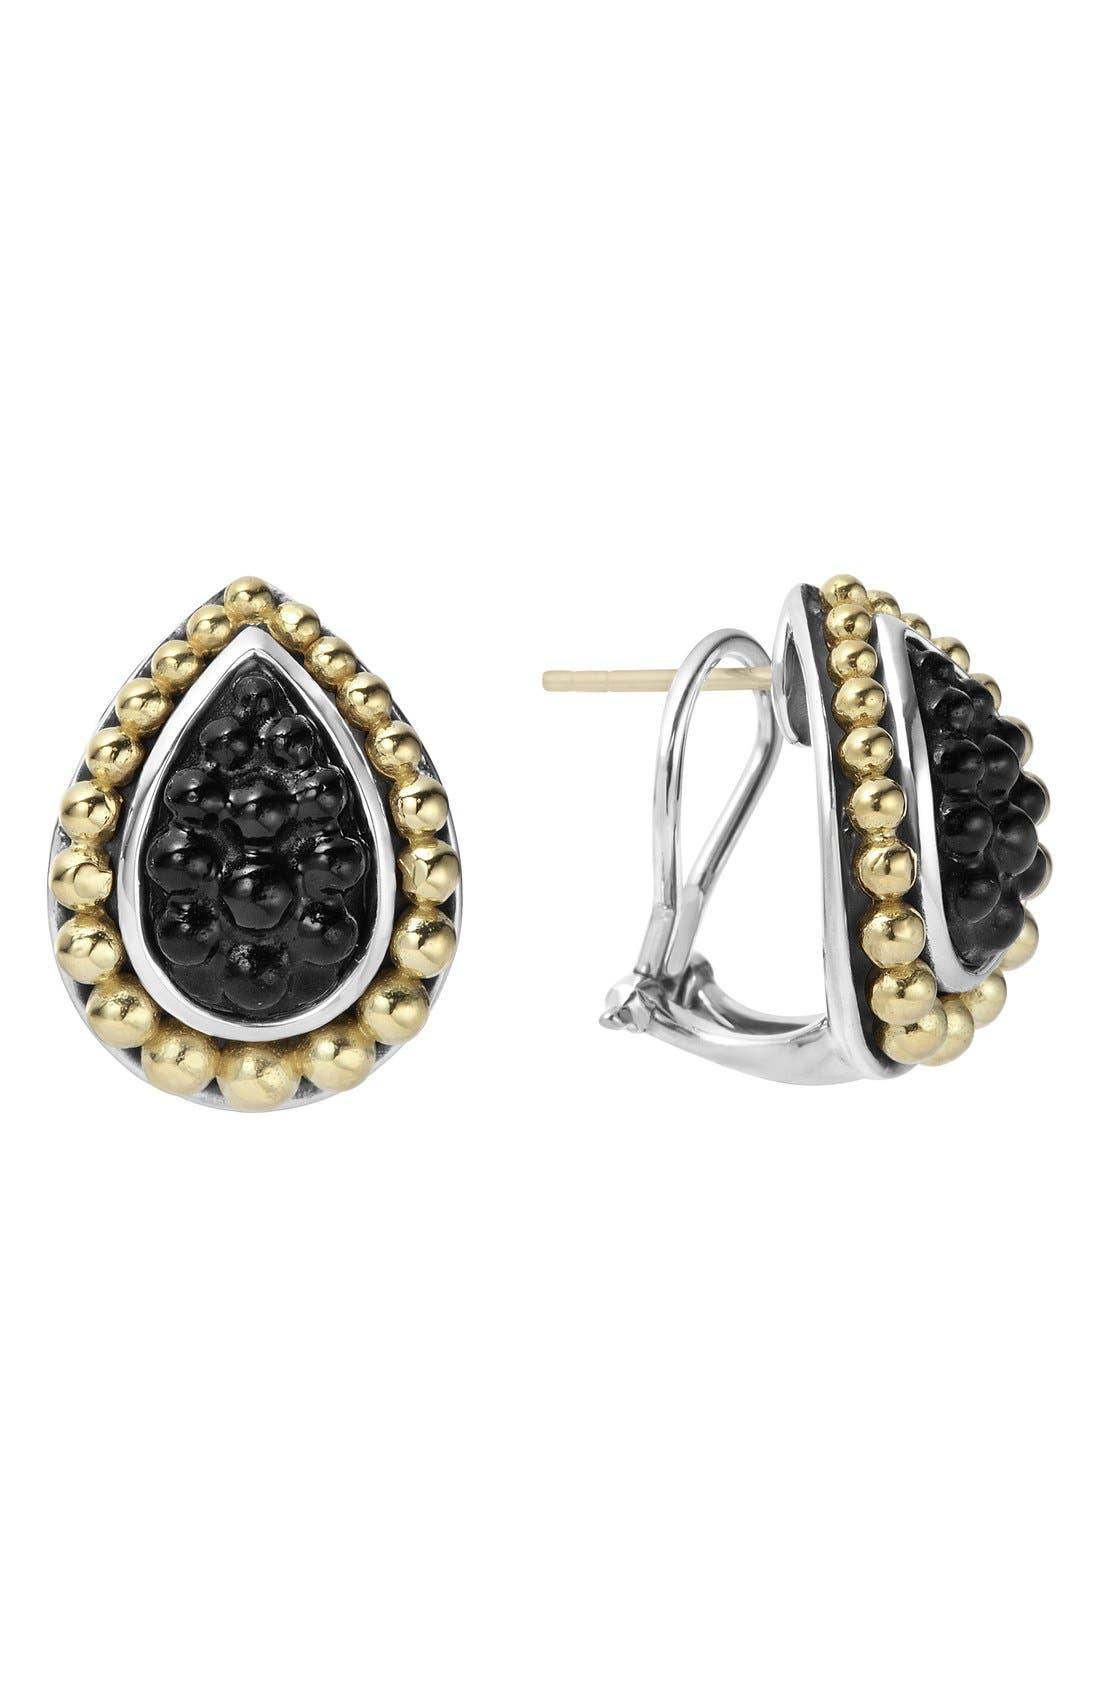 LAGOS 'Black Caviar' Stud Earrings